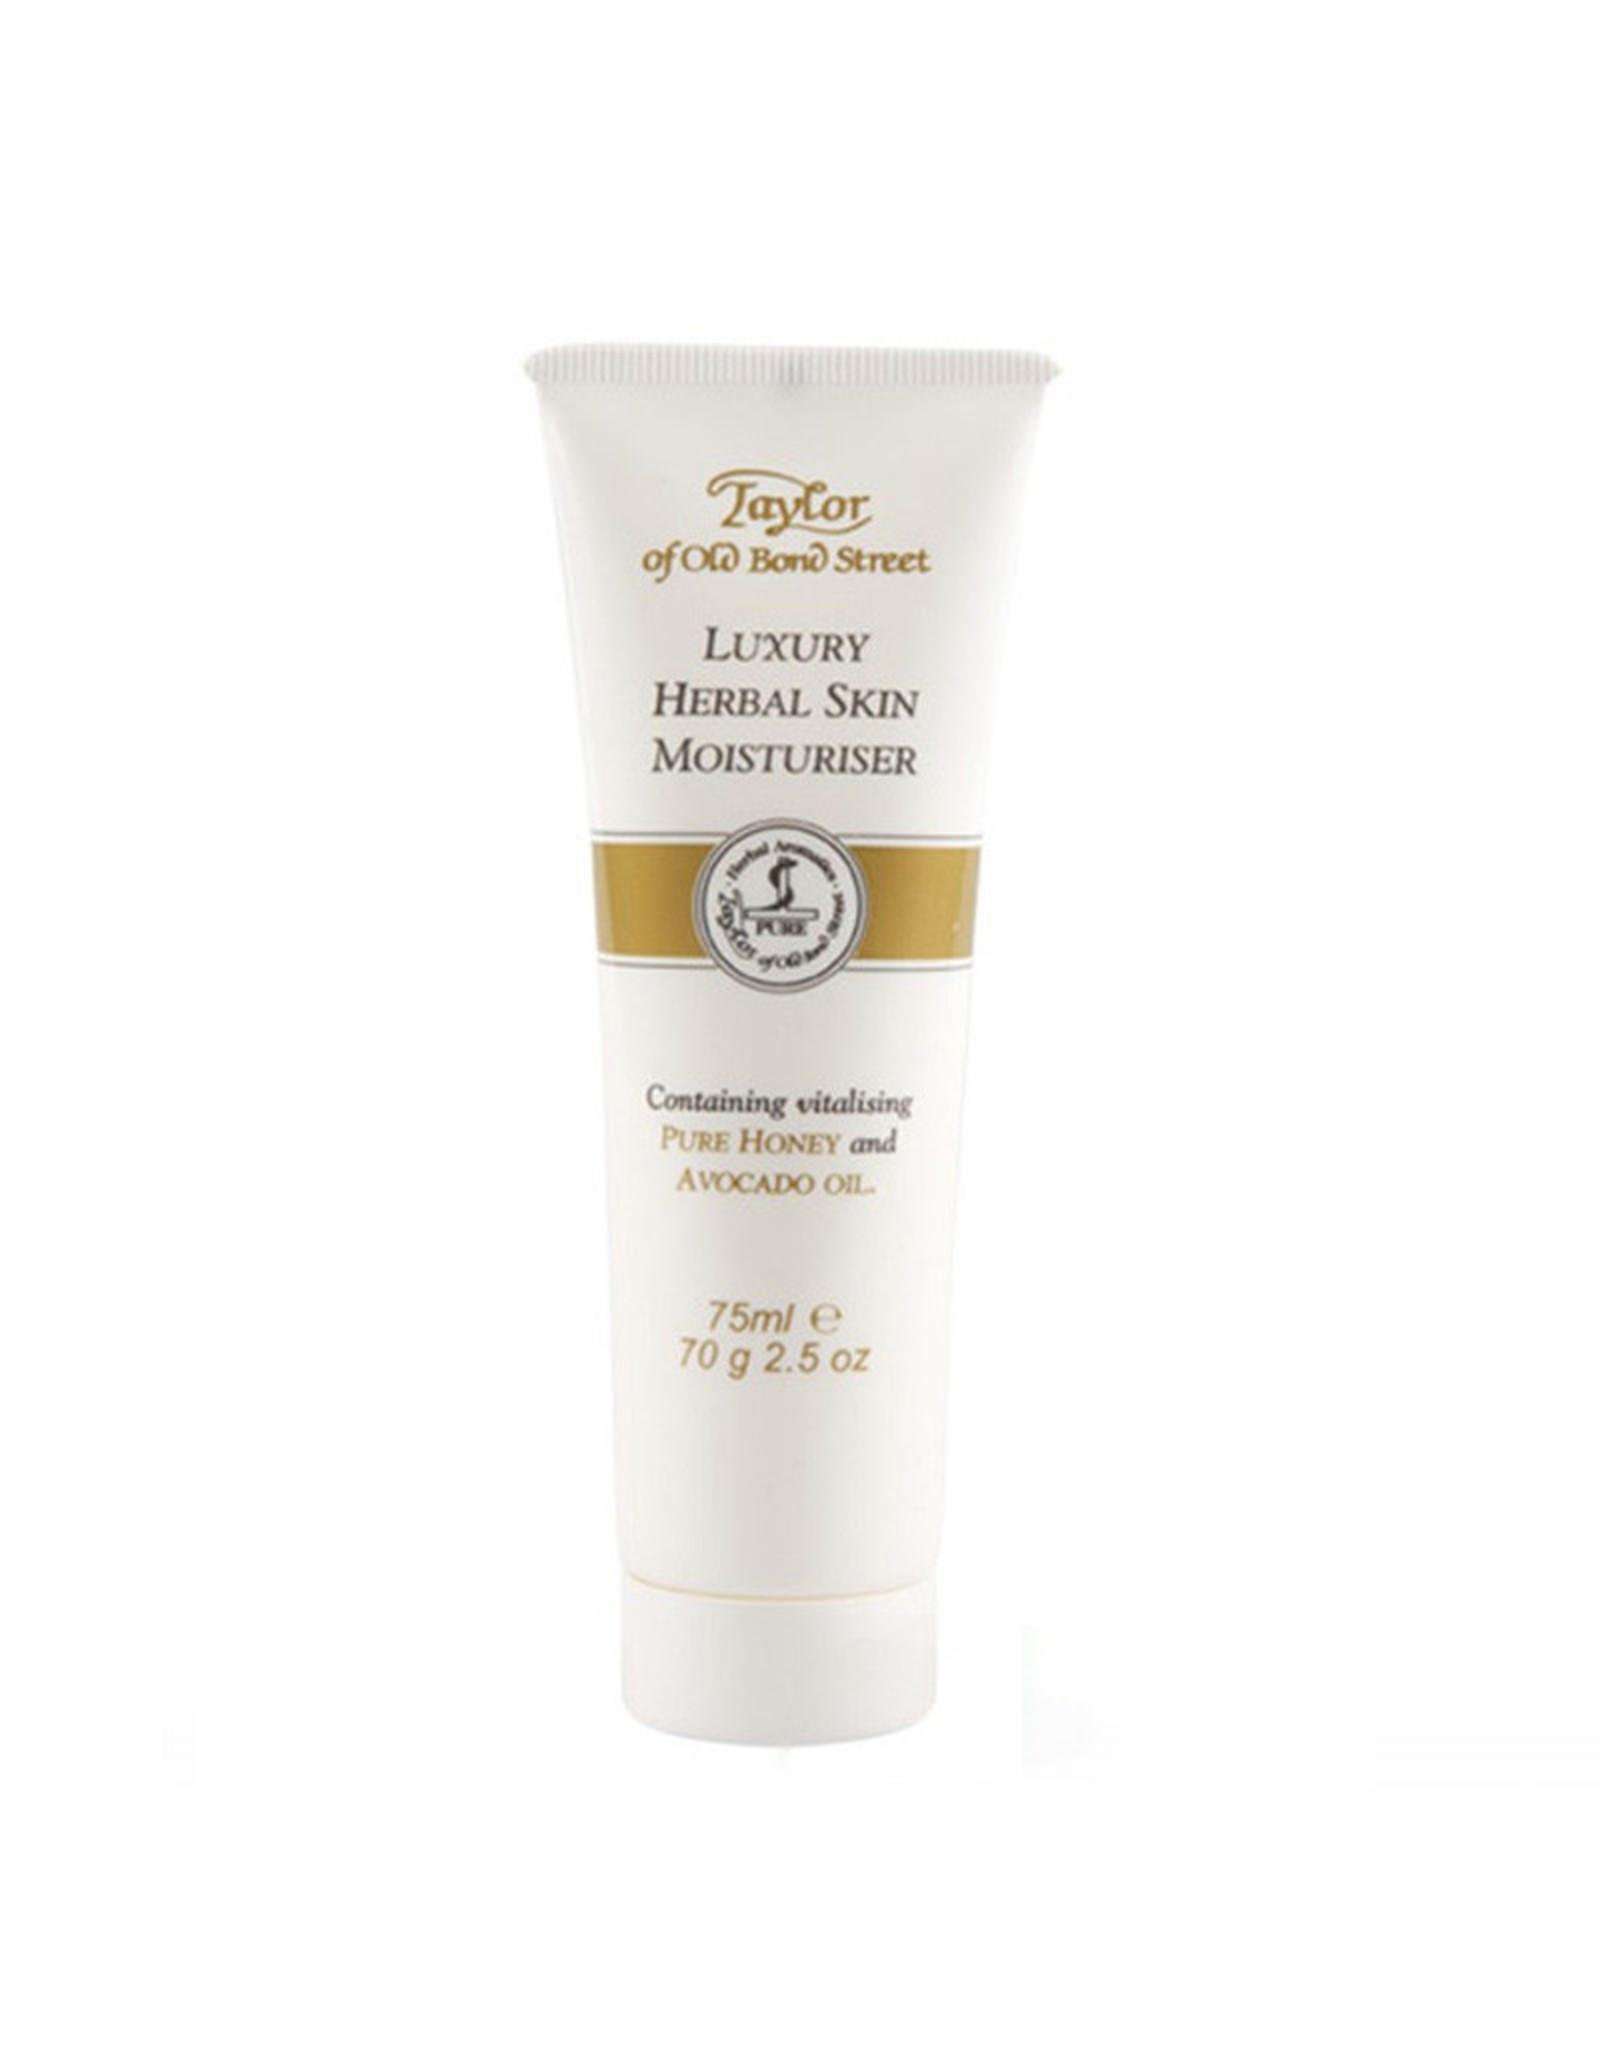 Taylor of Old Bond Street Herbal Skin Moisturiser 75ml